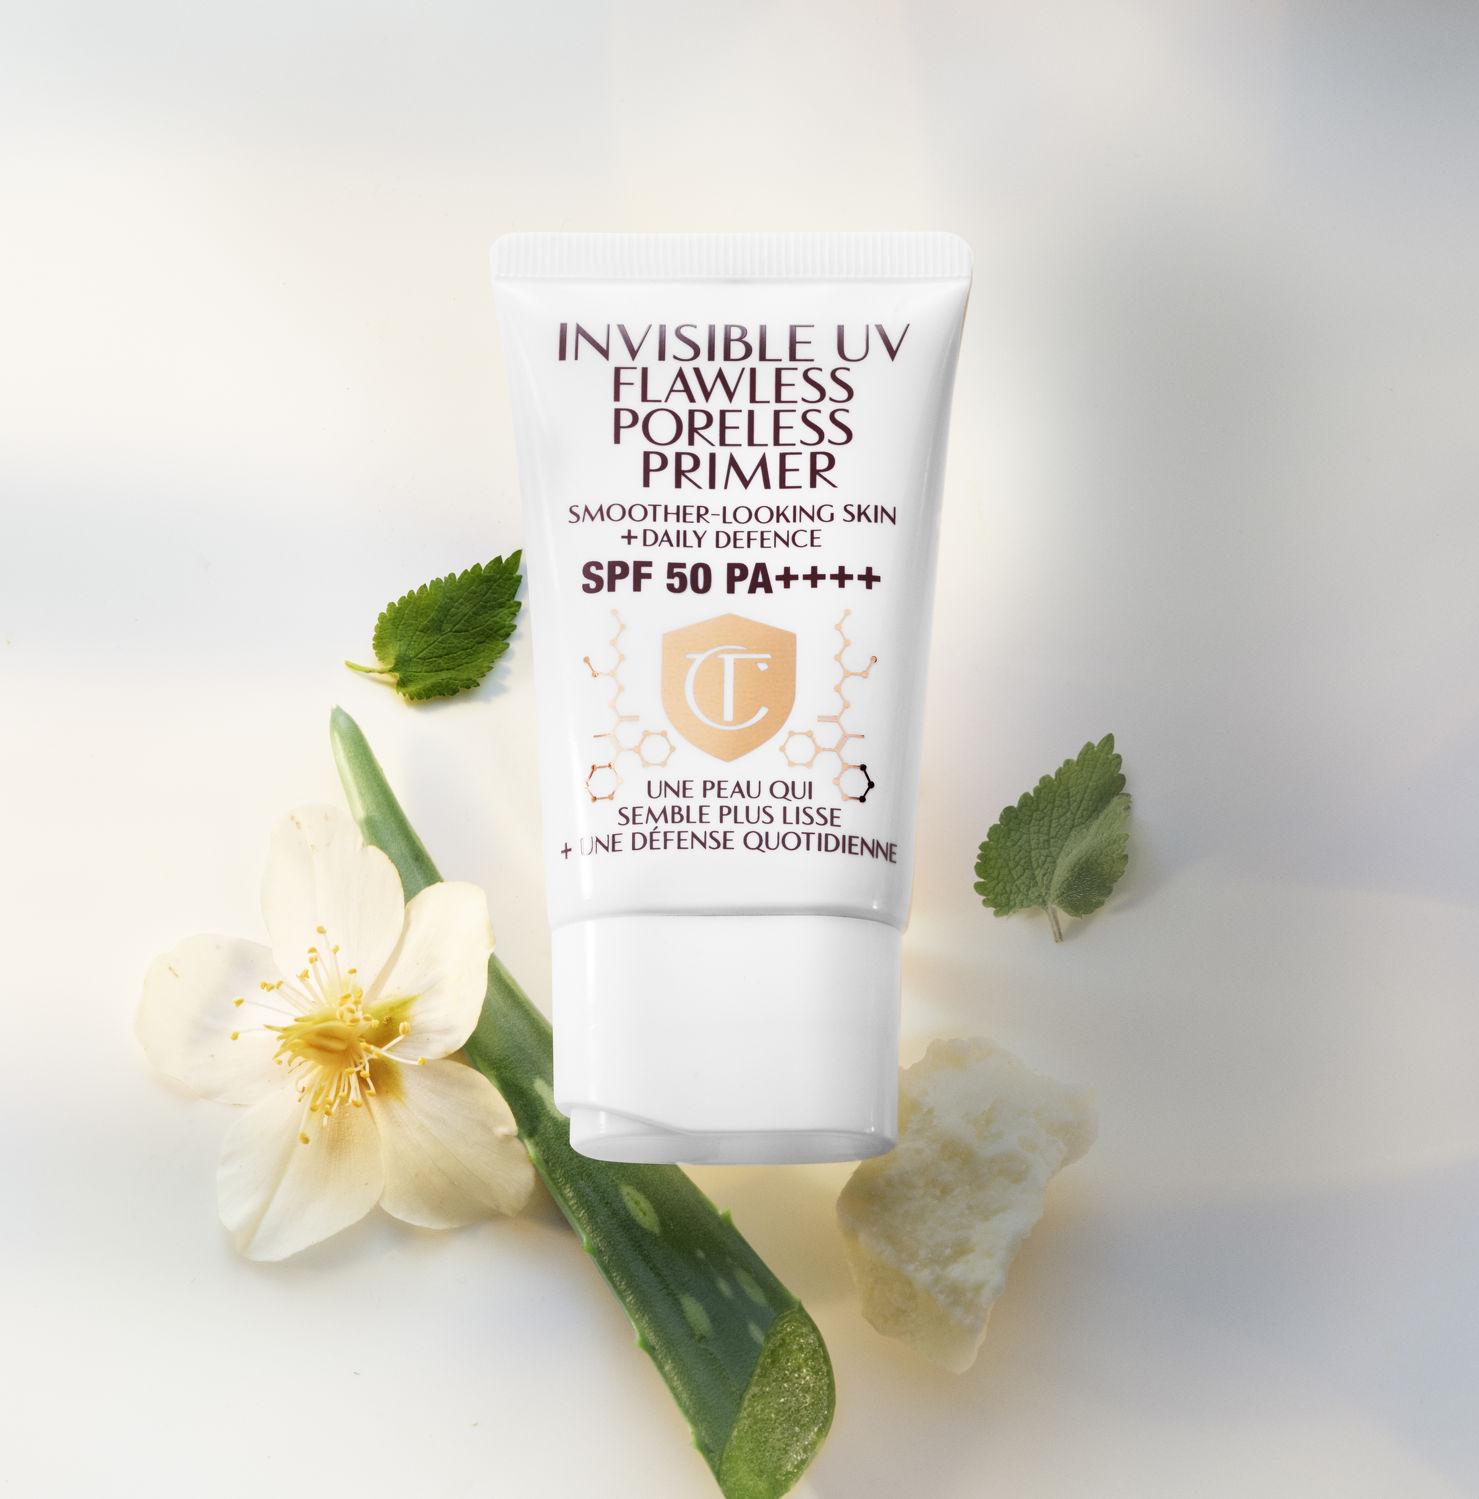 Charlotte Tilbury Invisible UV Flawless Poreless Primer SPF 50 PA - THE EDGE SINGAPORE